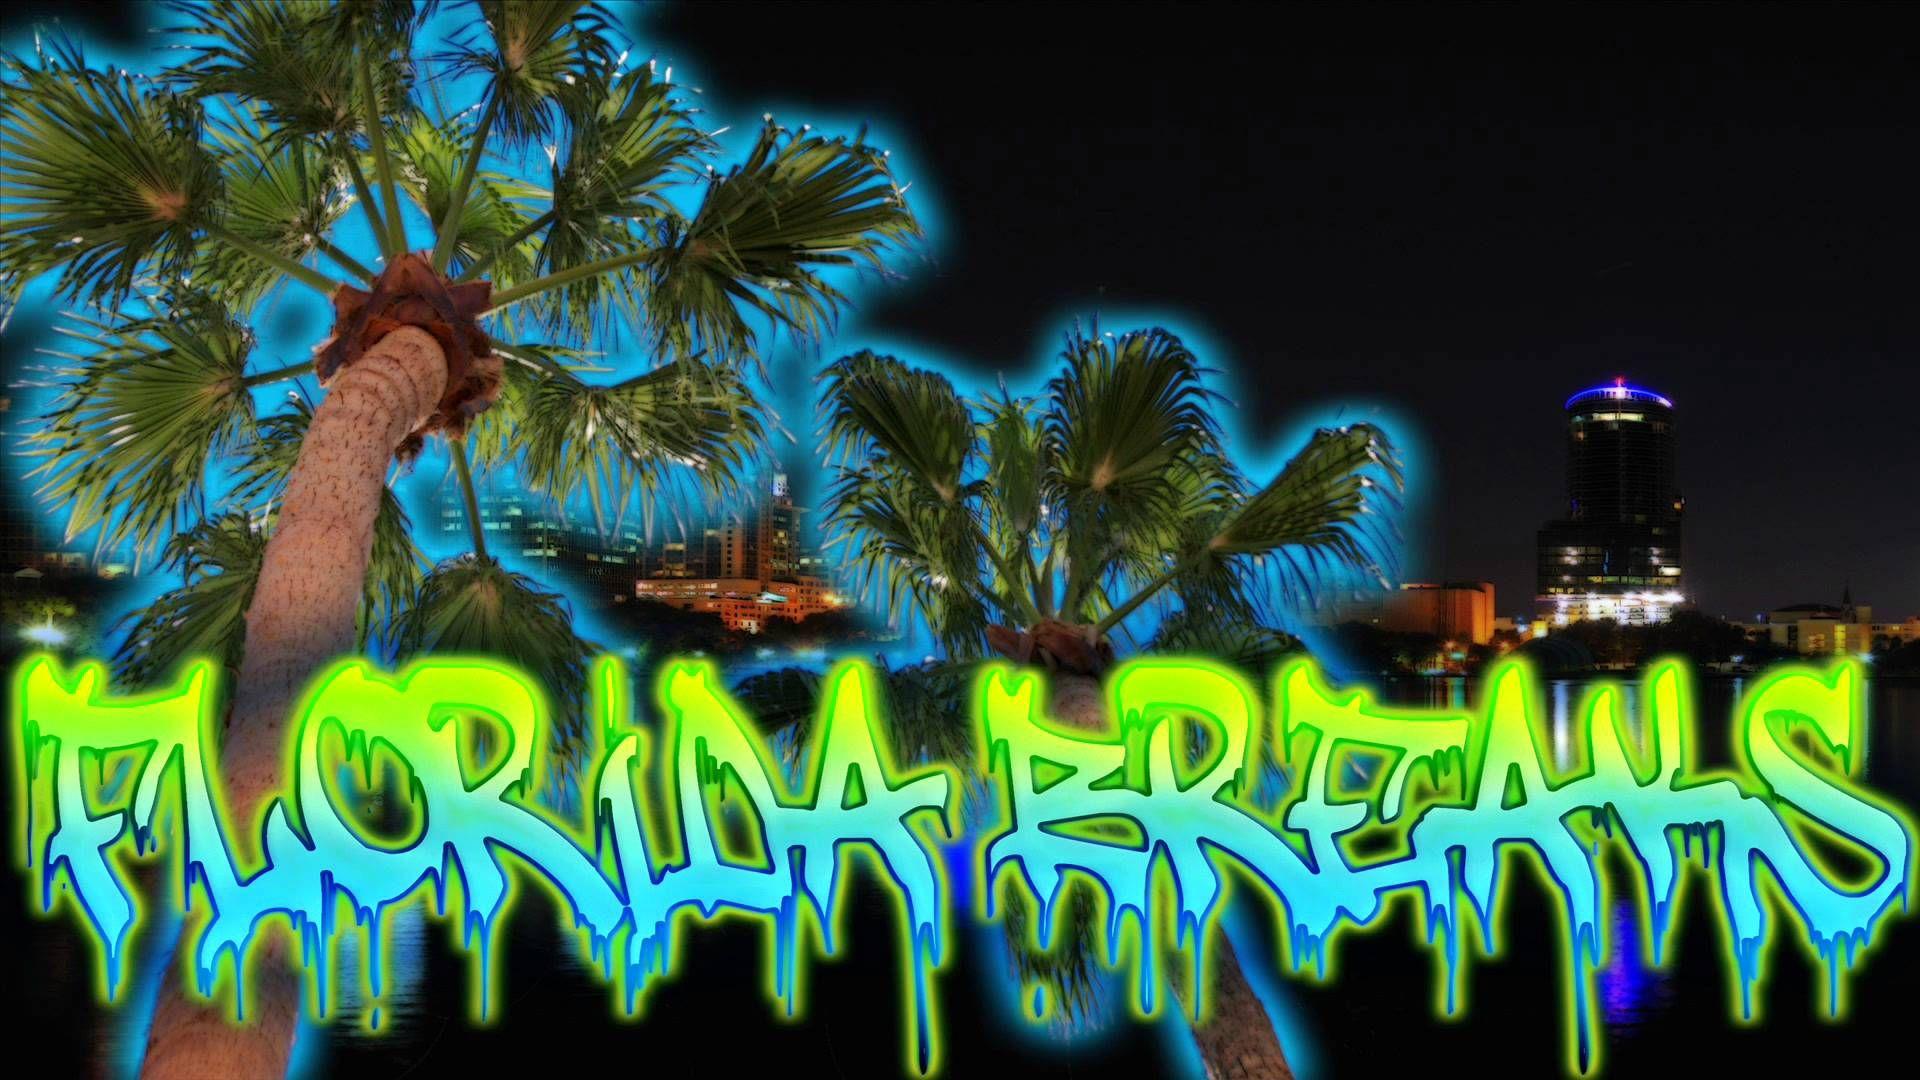 Bone Thugs N Harmony 1st Of Tha Month Artiphx Remix Three 6